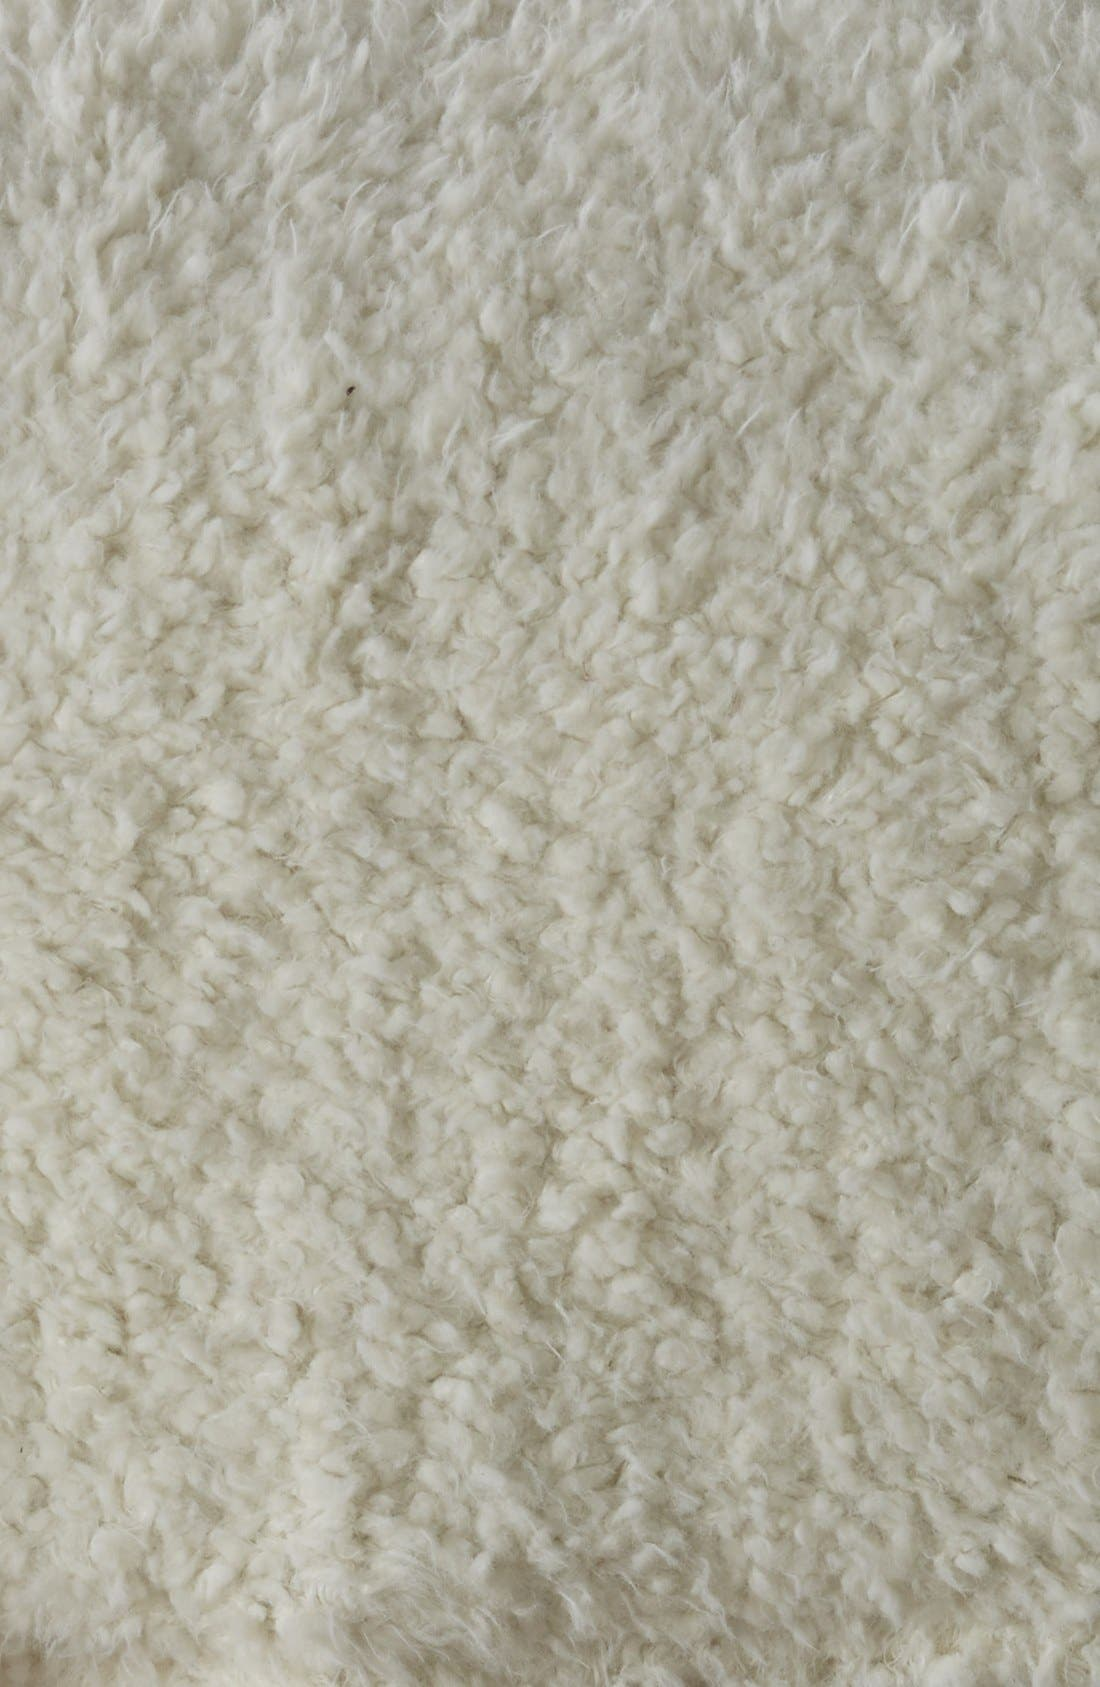 'Shaggy Plush' Faux Fur Blanket,                             Alternate thumbnail 4, color,                             900